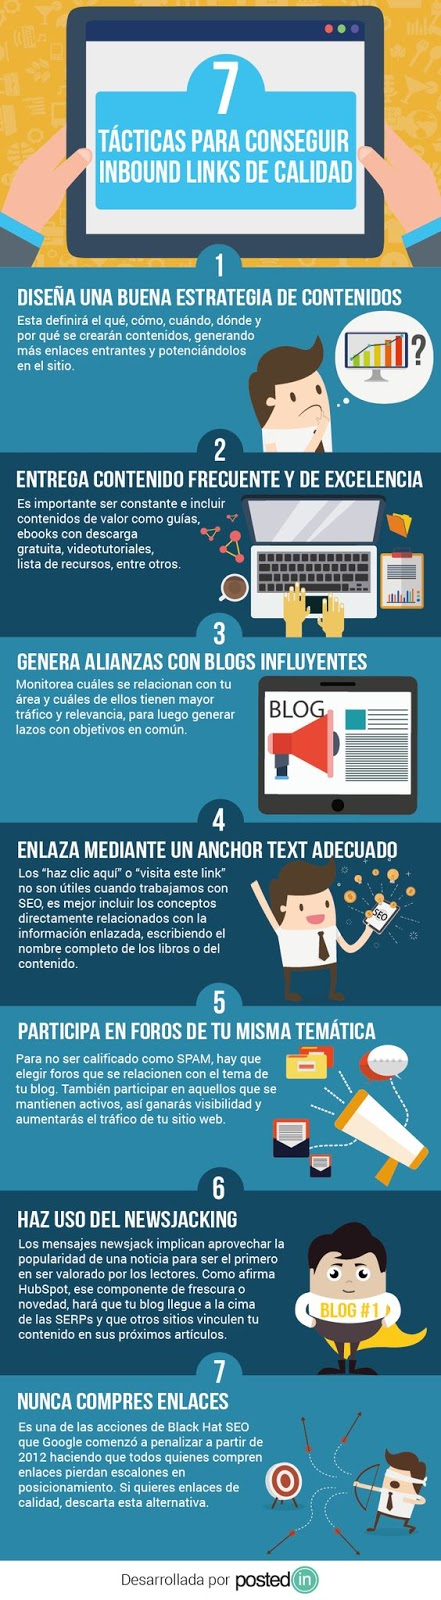 https://valerialandivar.com/2017/06/7-consejos-para-conseguir-enlaces-inbound-de-calidad-infografia.html